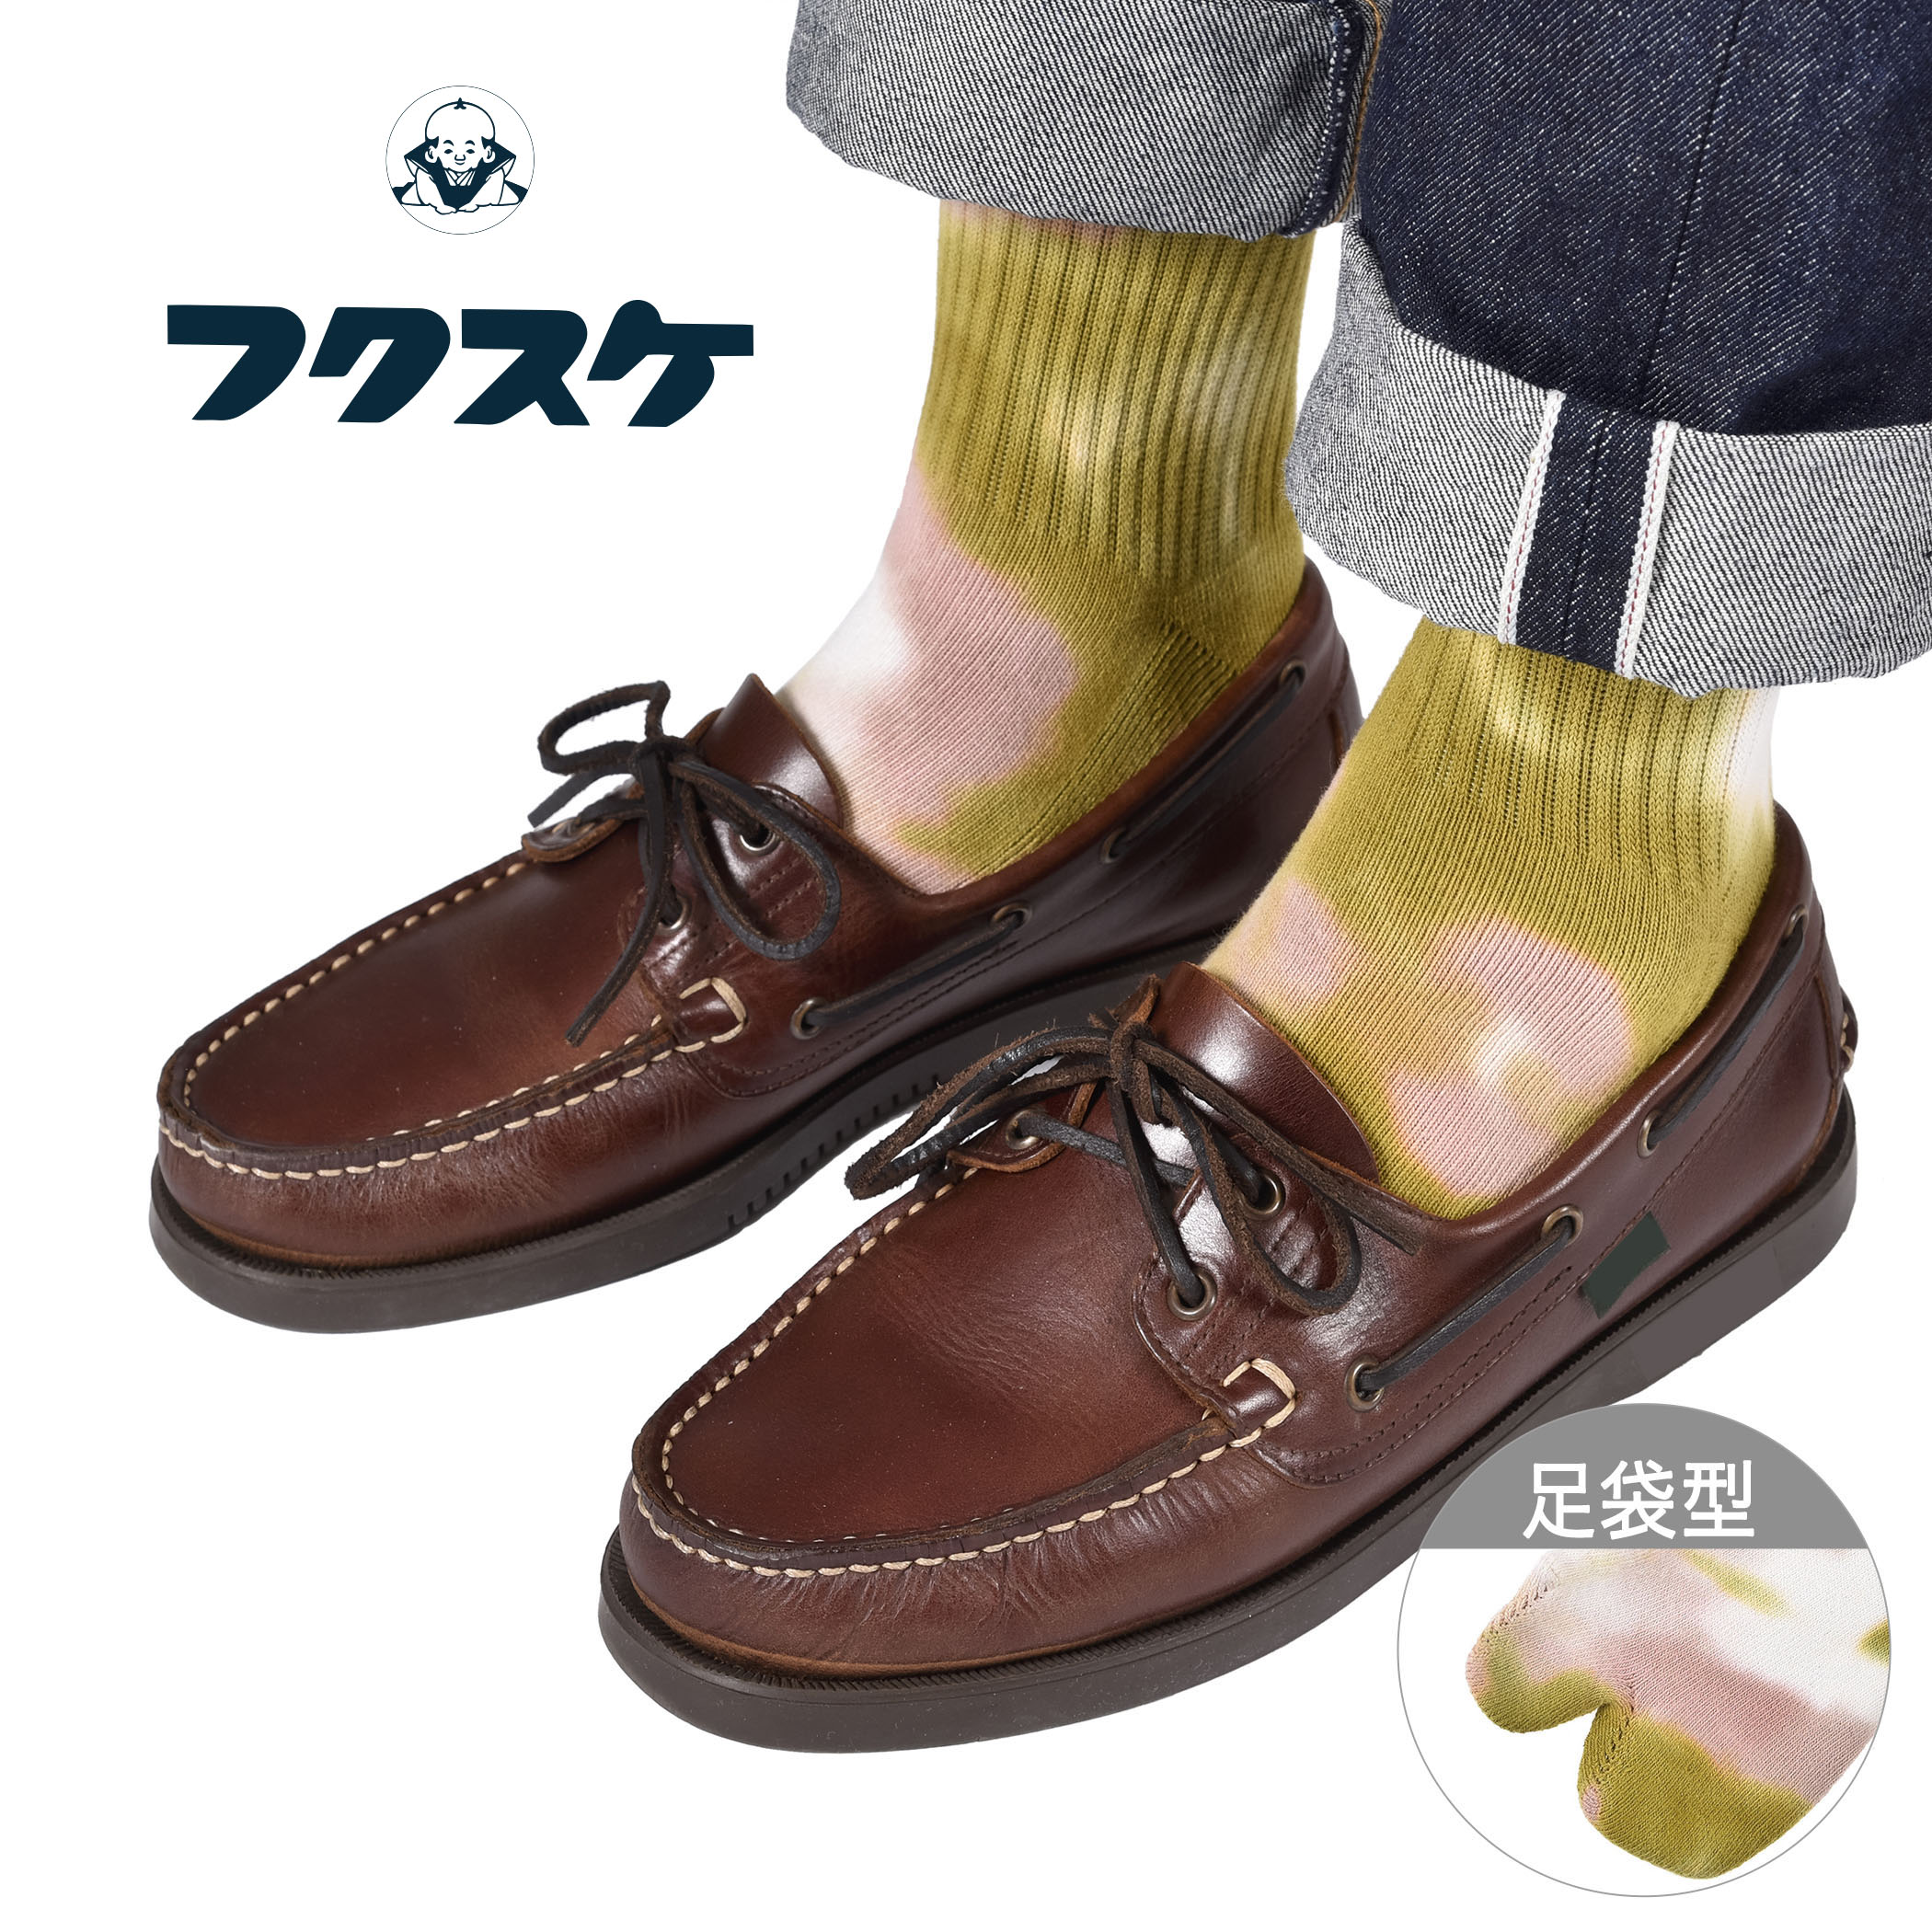 fukuske タイダイ柄 足袋型 クルー丈 ソックス